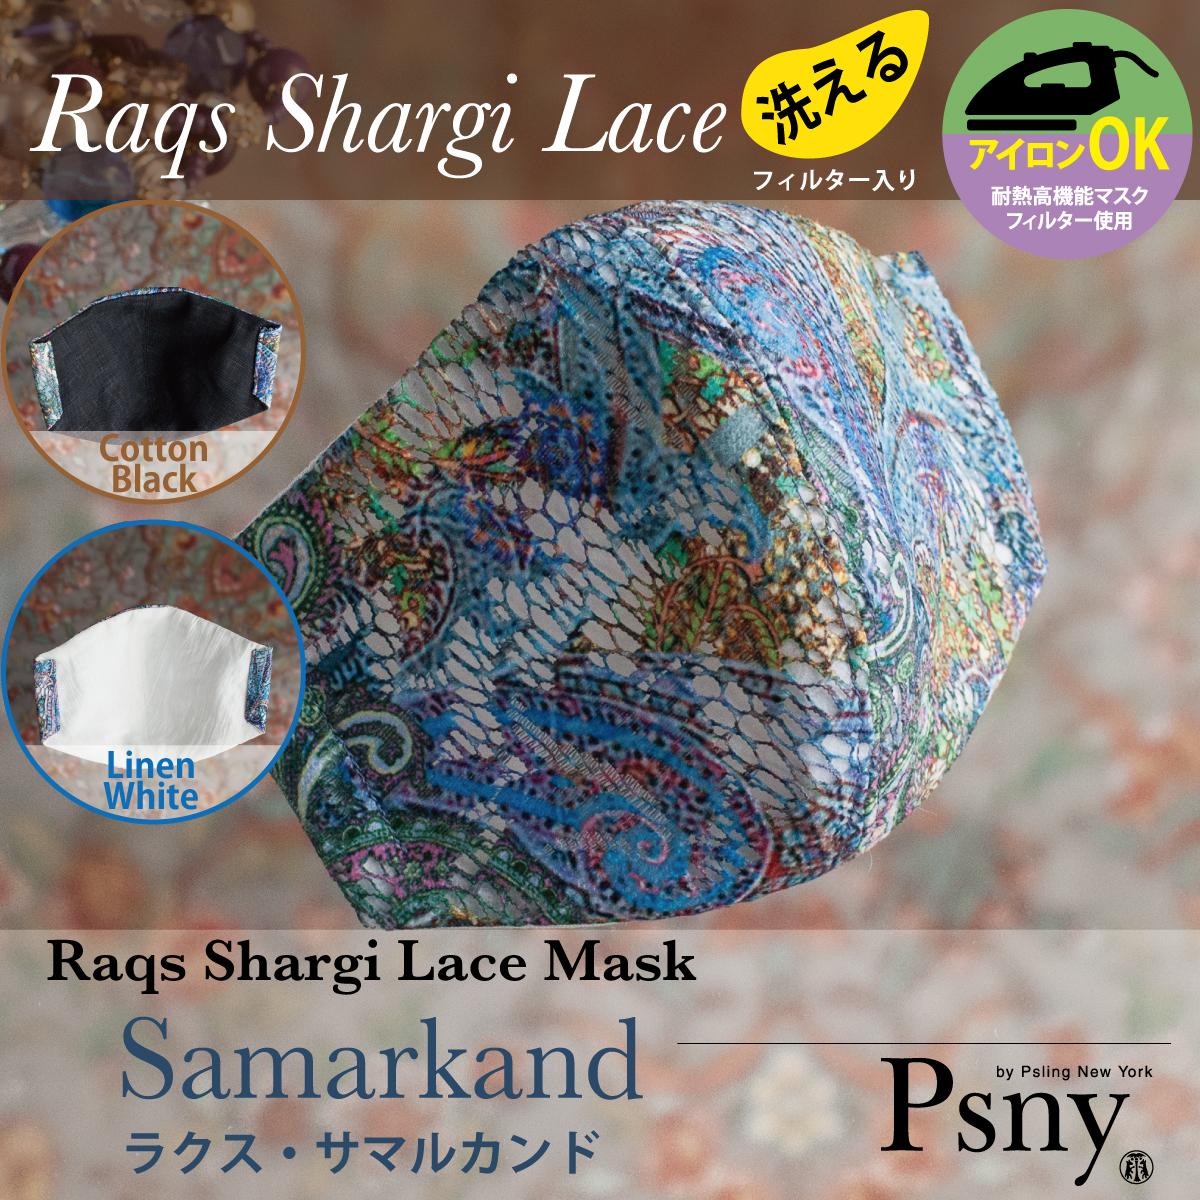 PSNY ラクス・サマルカンド 花粉 黄砂 洗えるフィルター入り 立体 マスク 大人用 送料無料